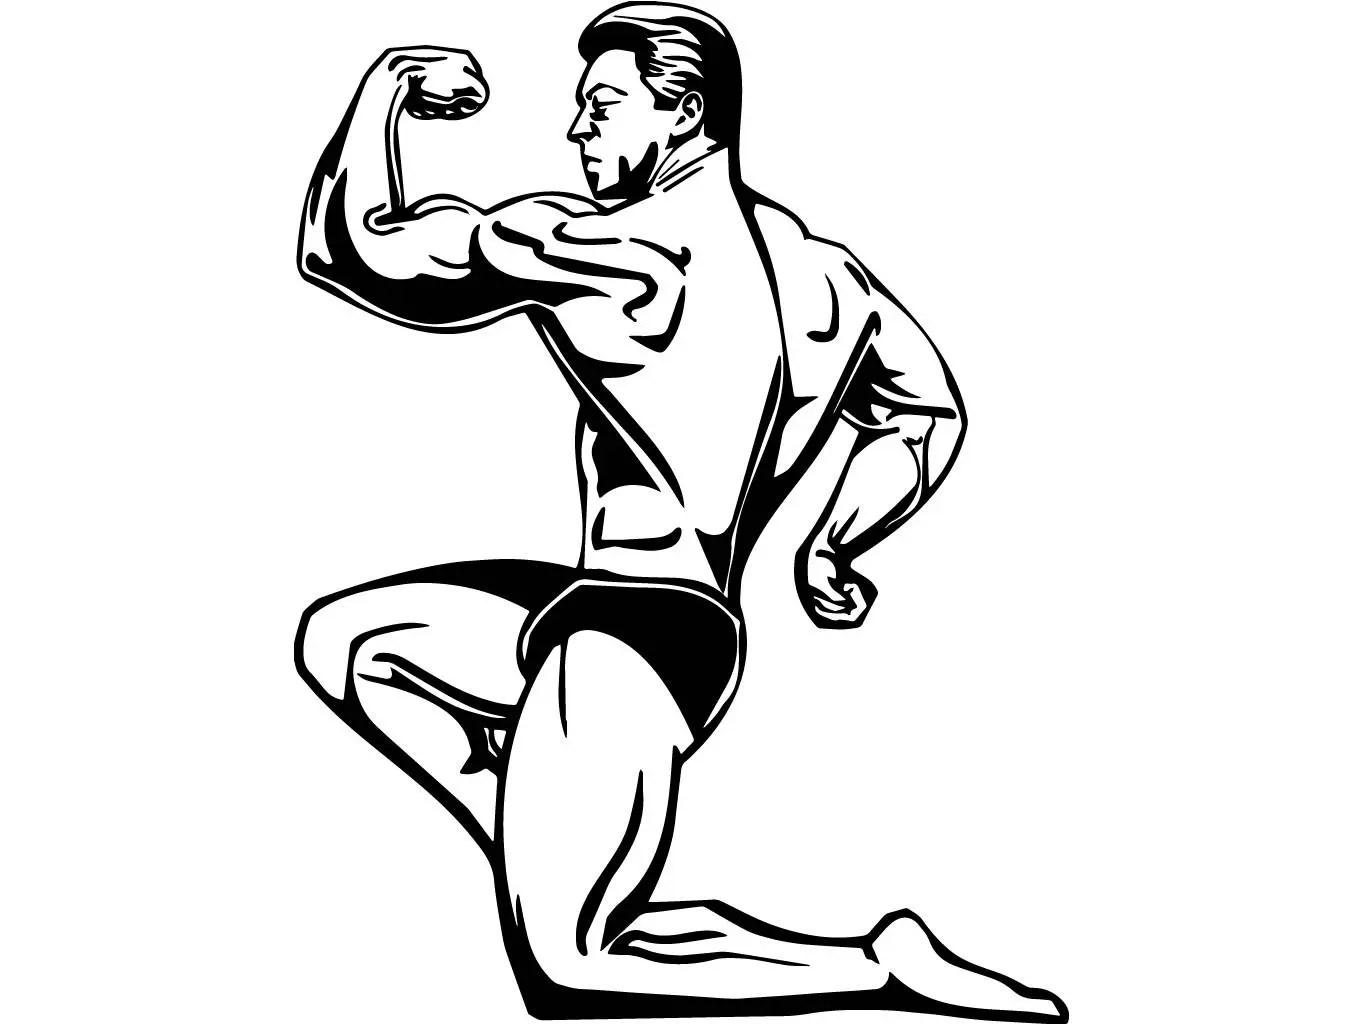 Bodybuilder 19 Bodybuilding Logo Front Pose Weightlifting